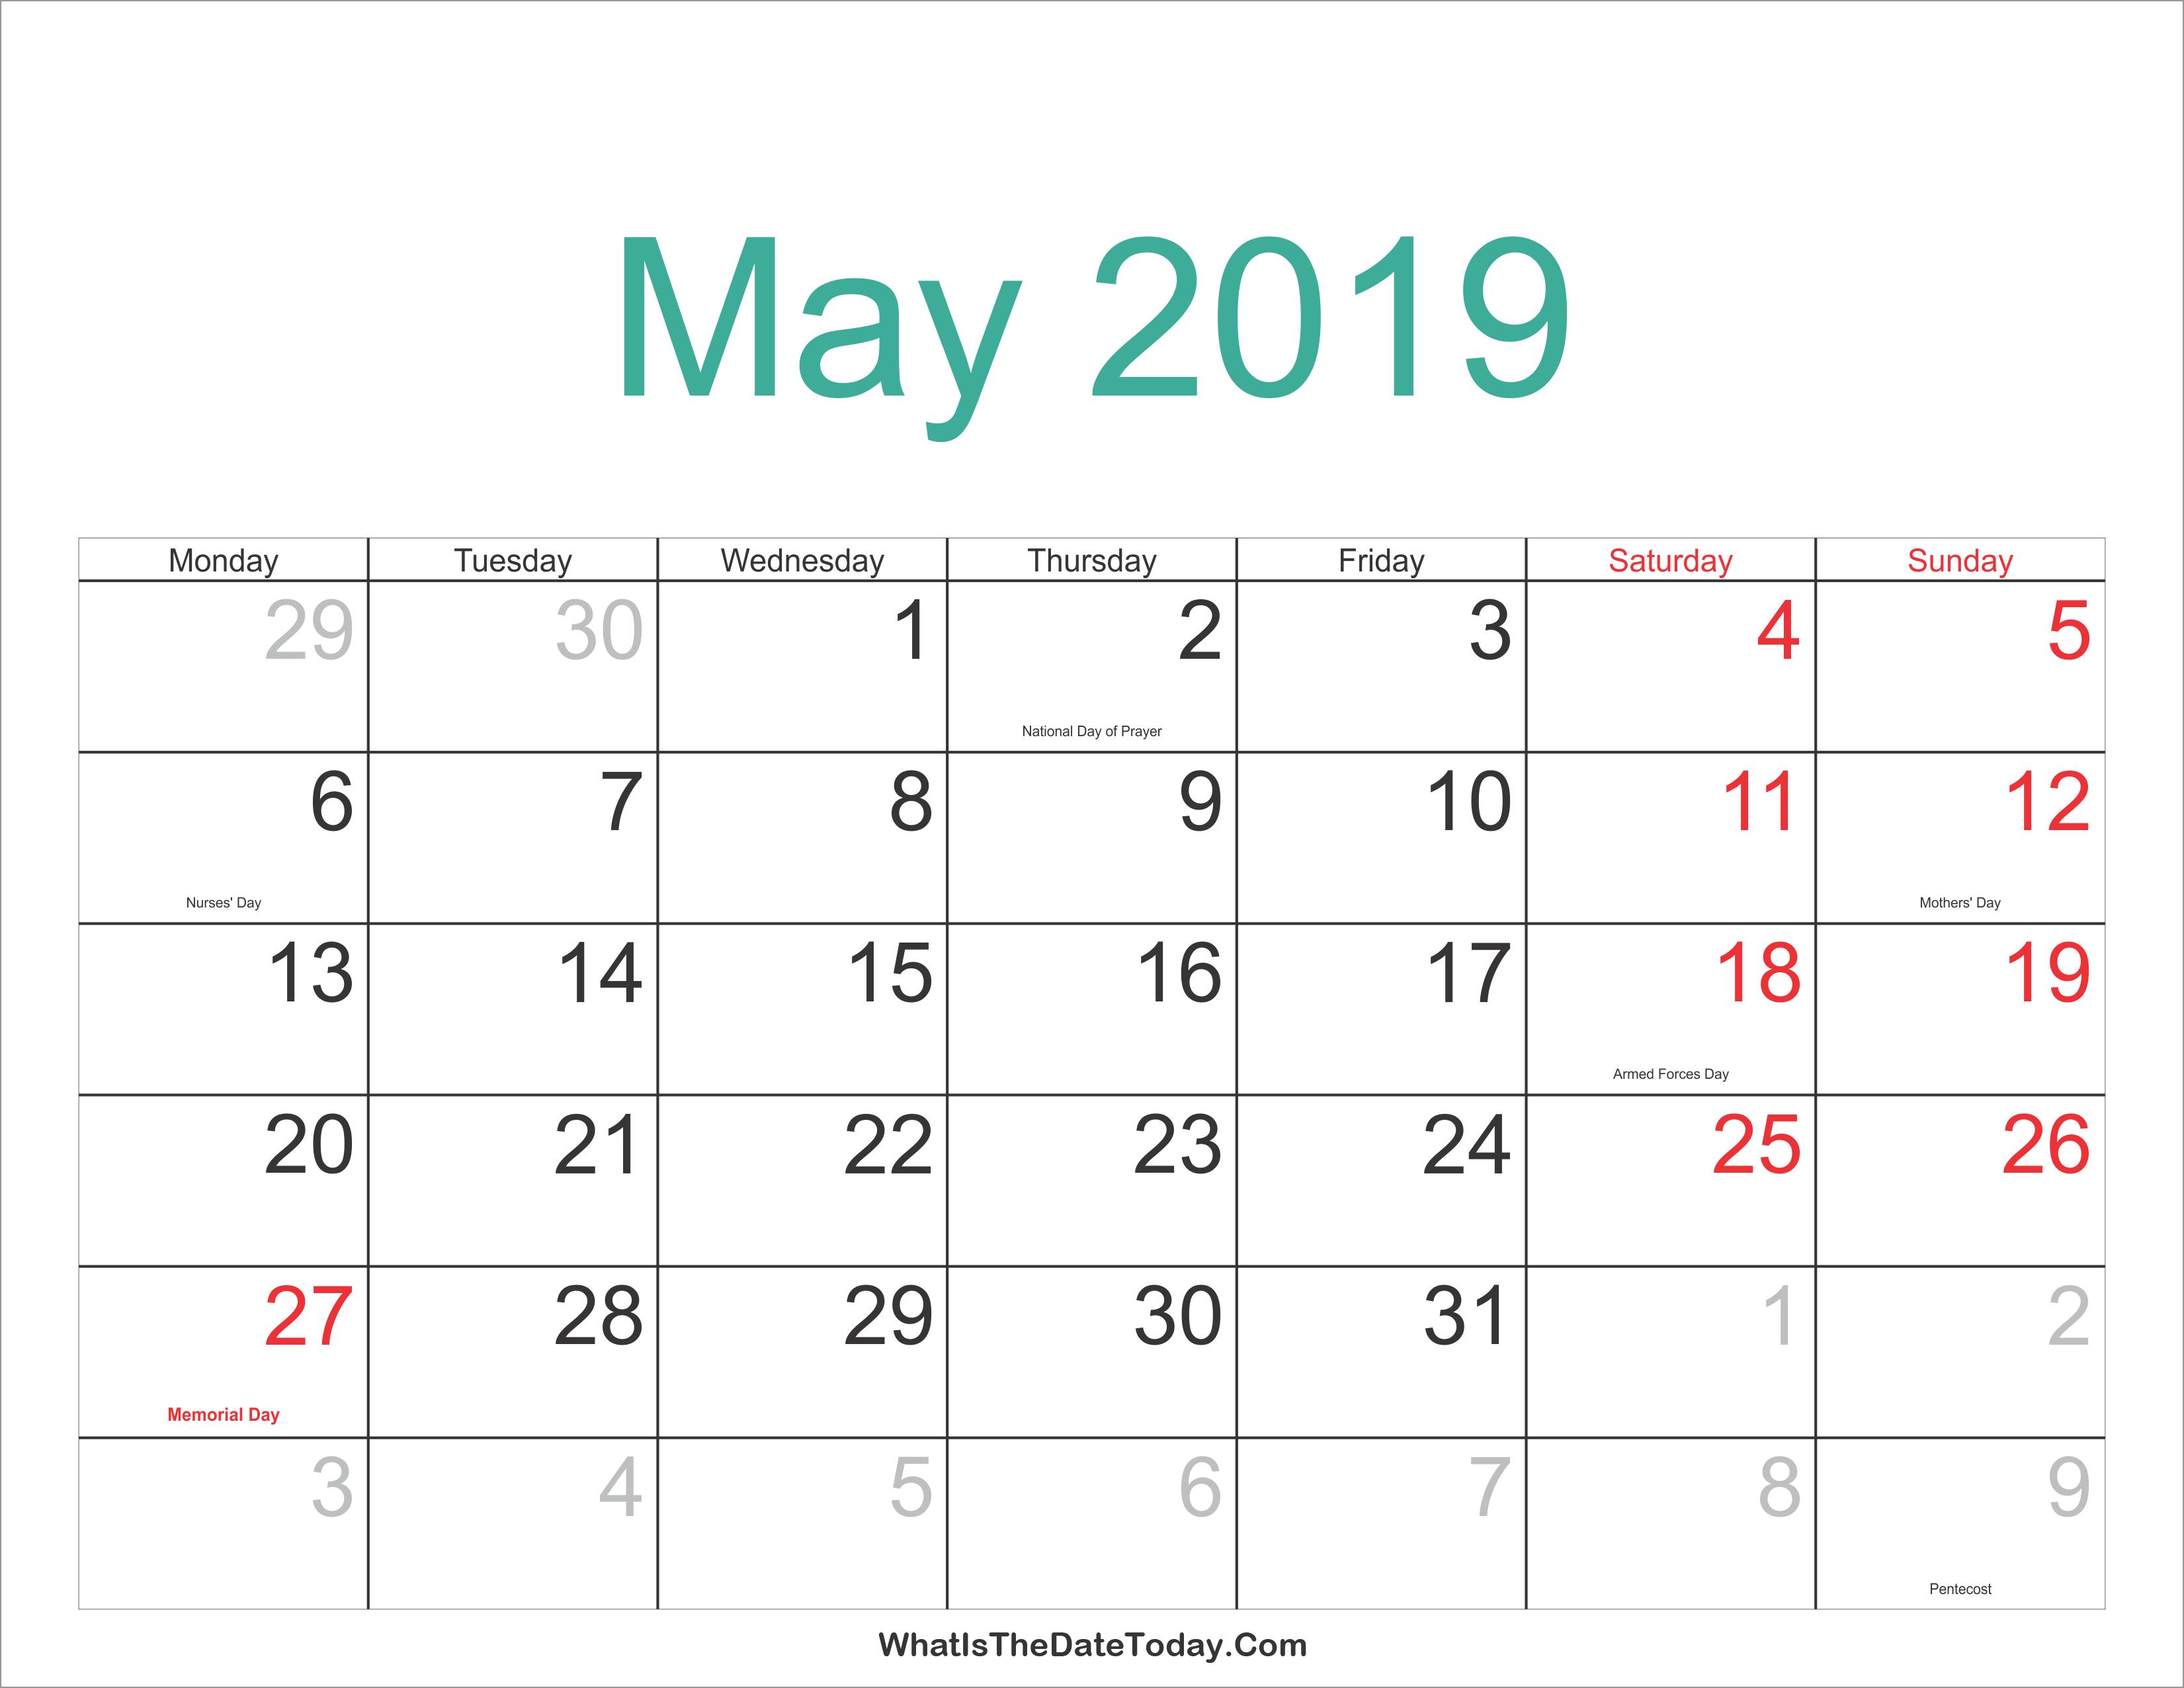 May 2019 Calendar With Holidays – Free Printable Calendar, Templates May 2 2019 Calendar